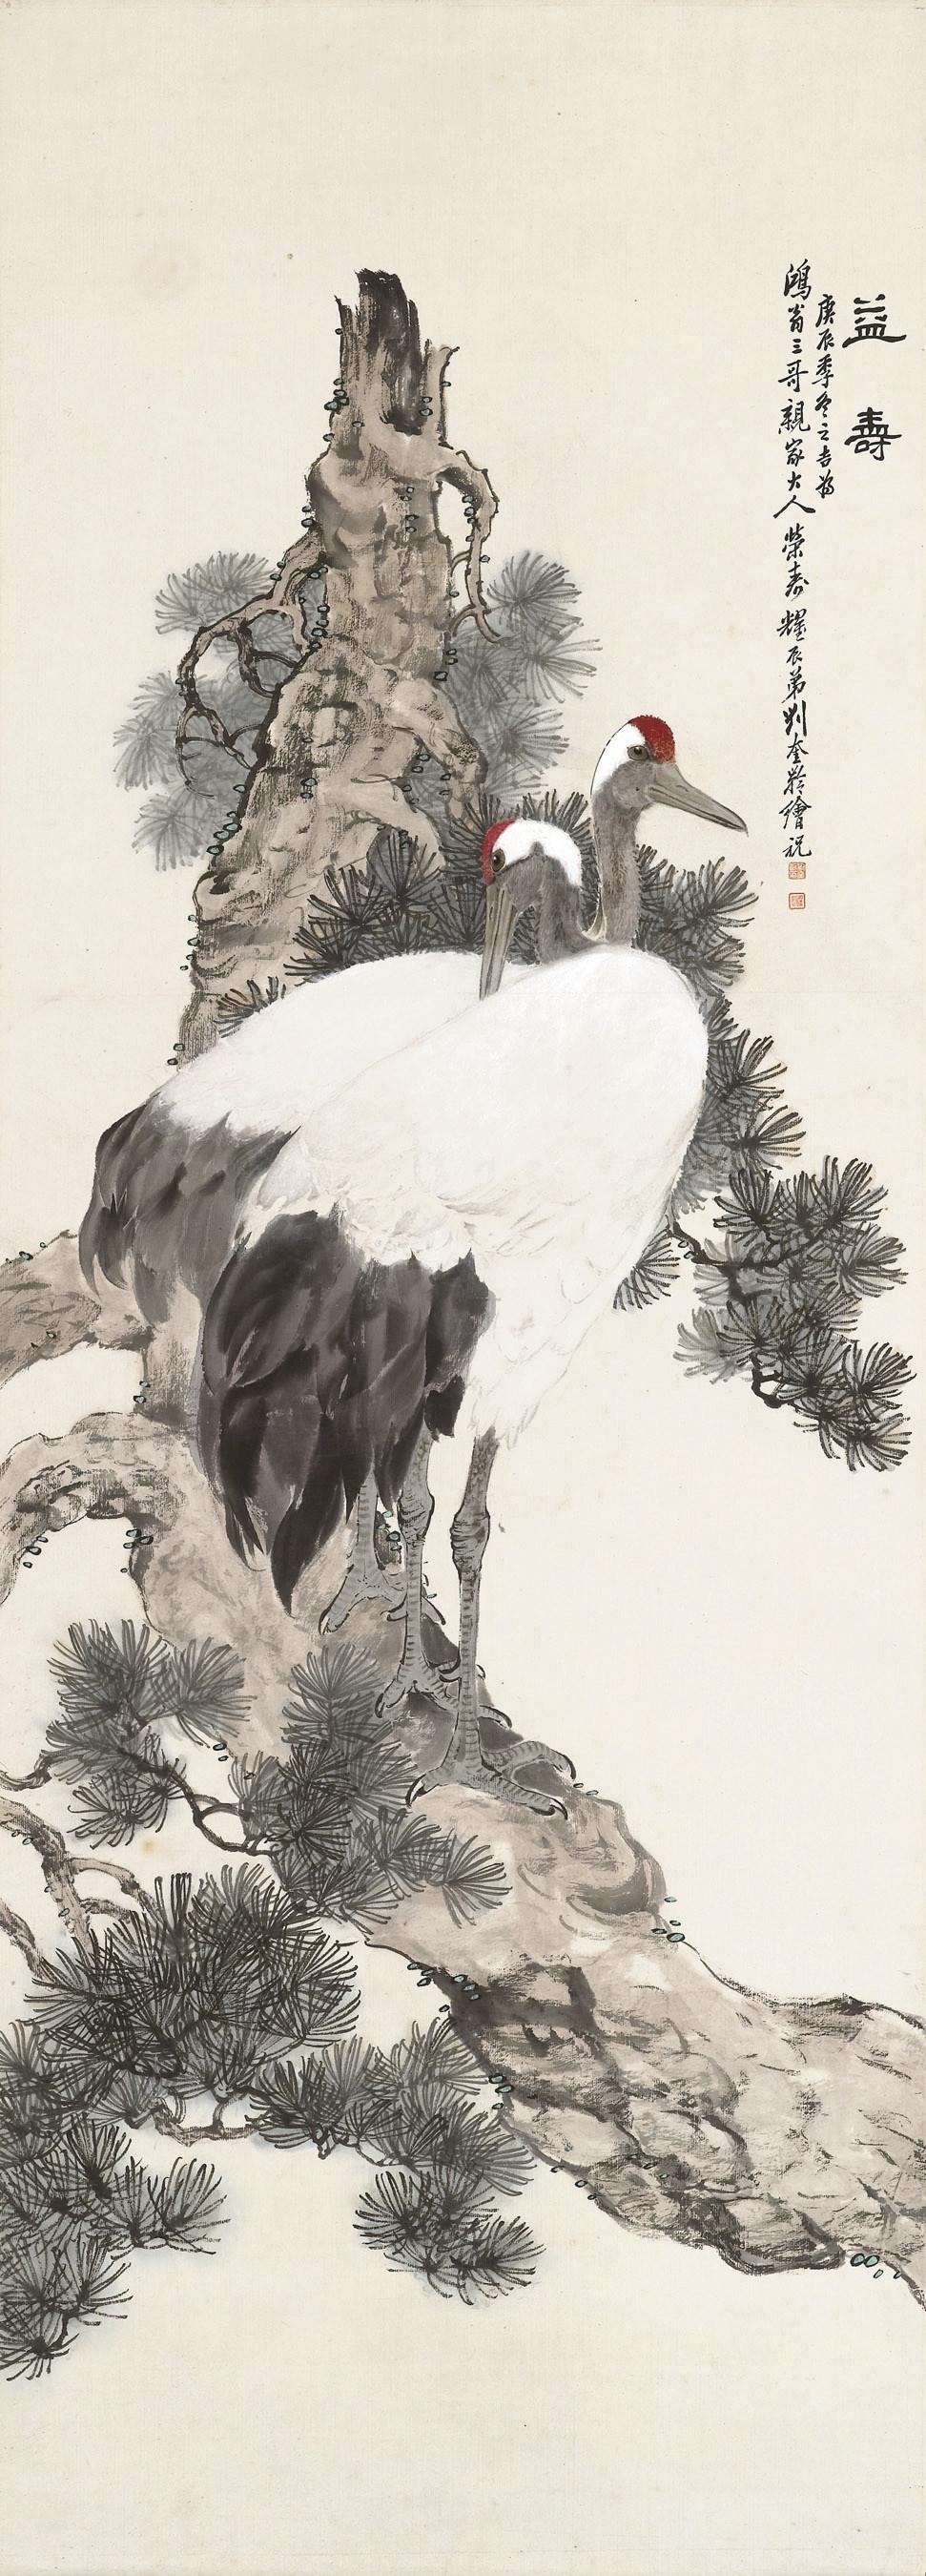 LIU KUILING (1885-1967)